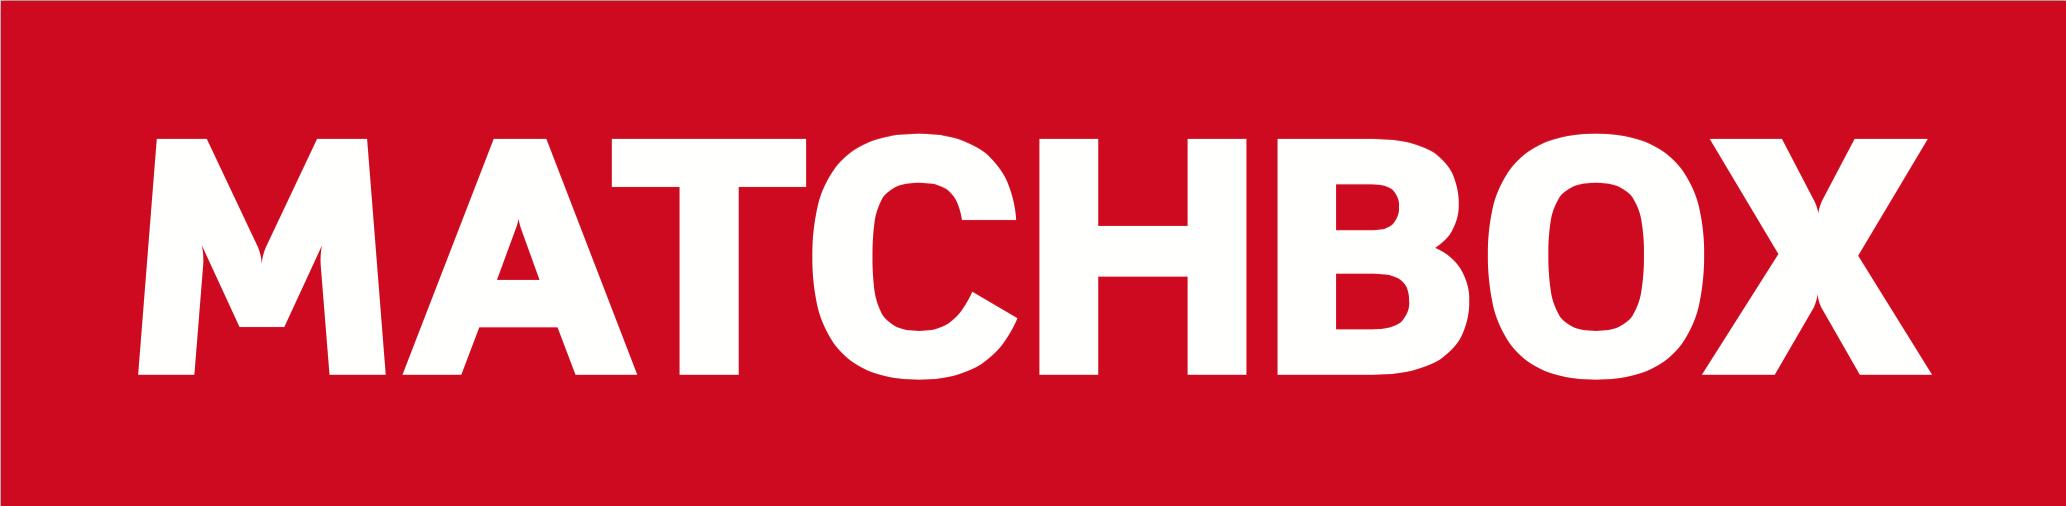 Matchbox Mobile